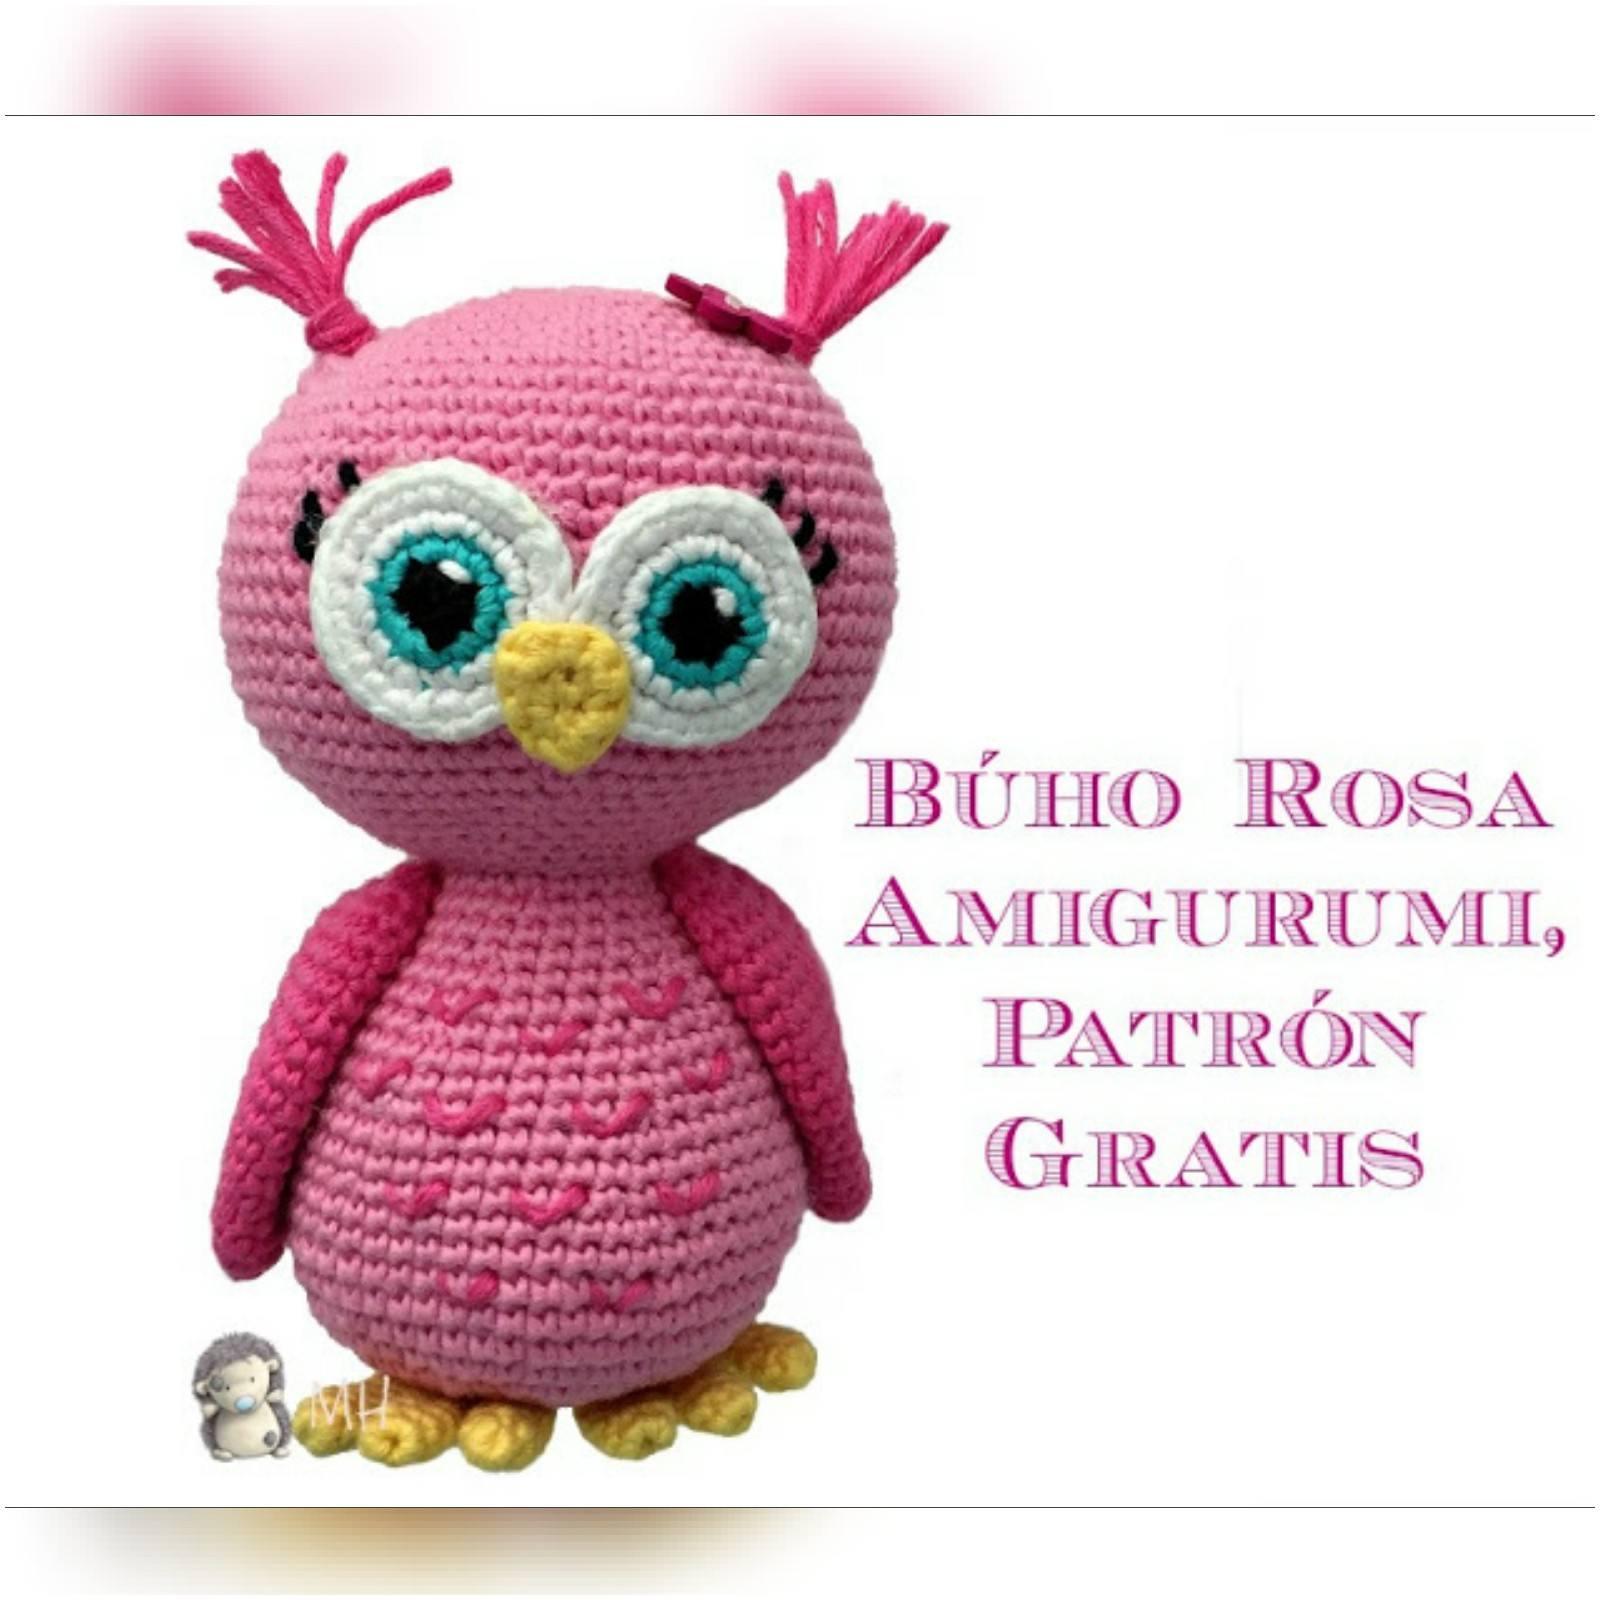 Amigurumislandia: Búho rosa amigurumi